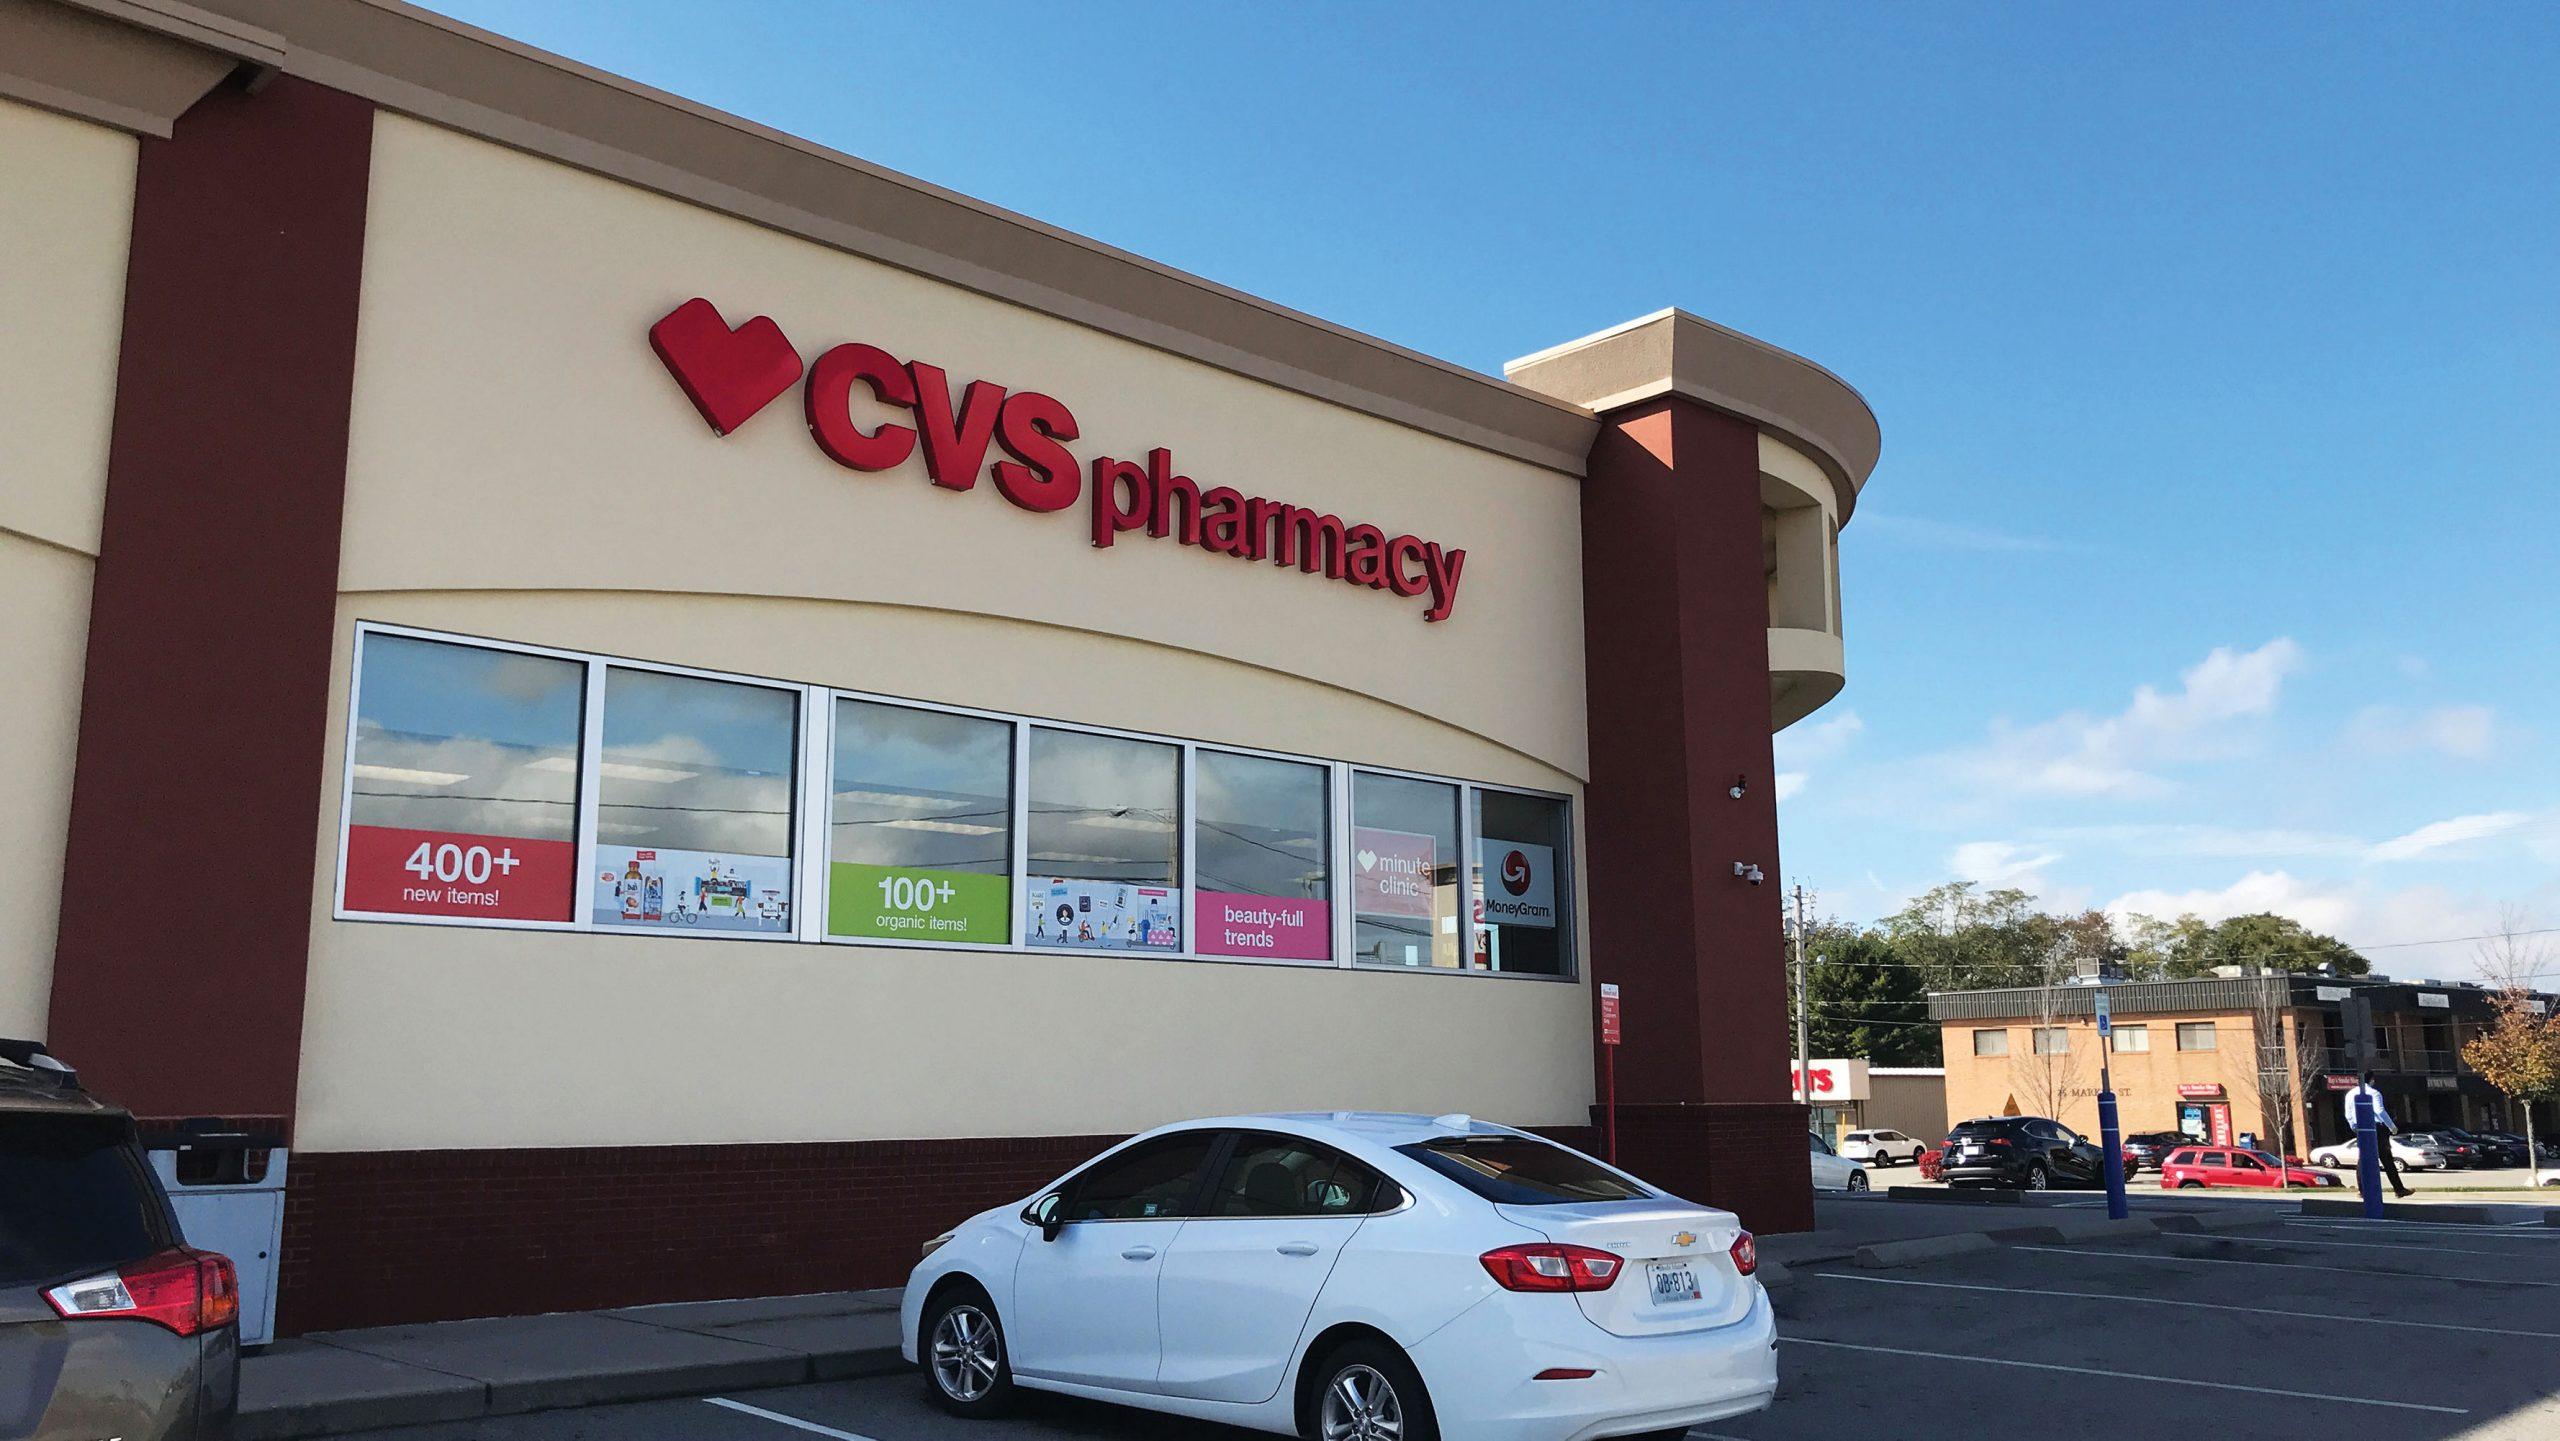 cvs pharmacy otc covid 19 testing 1 16x9 1 scaled.